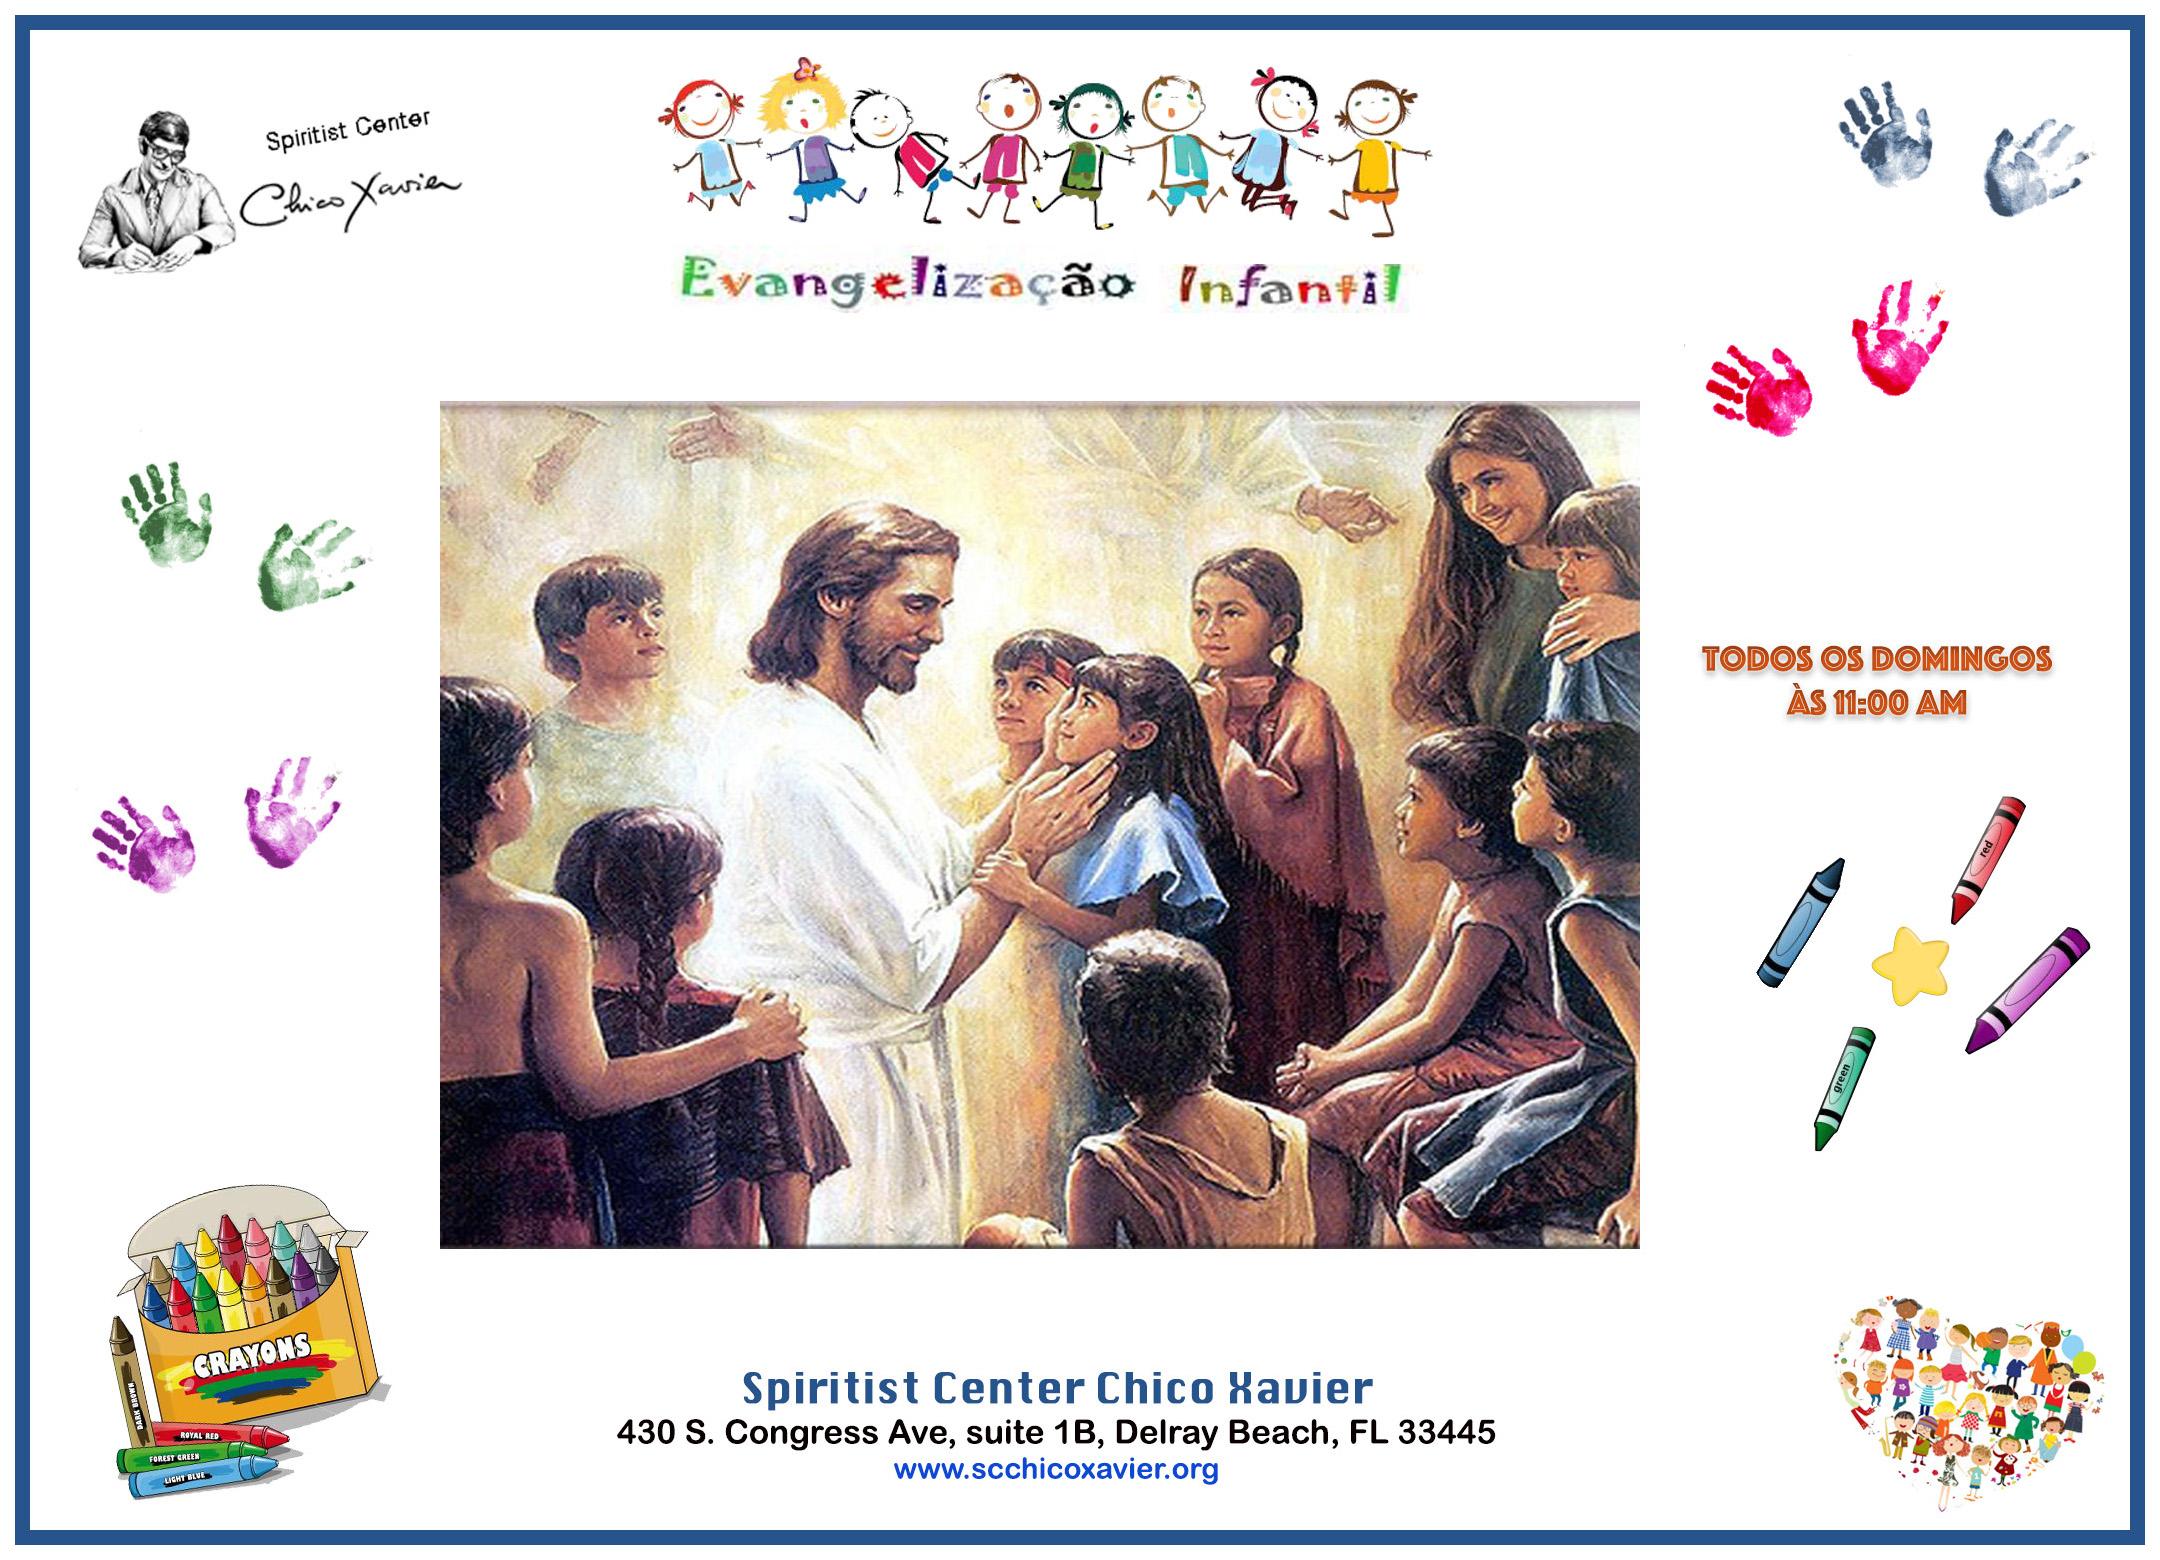 Evangelização Infantil domingos framed